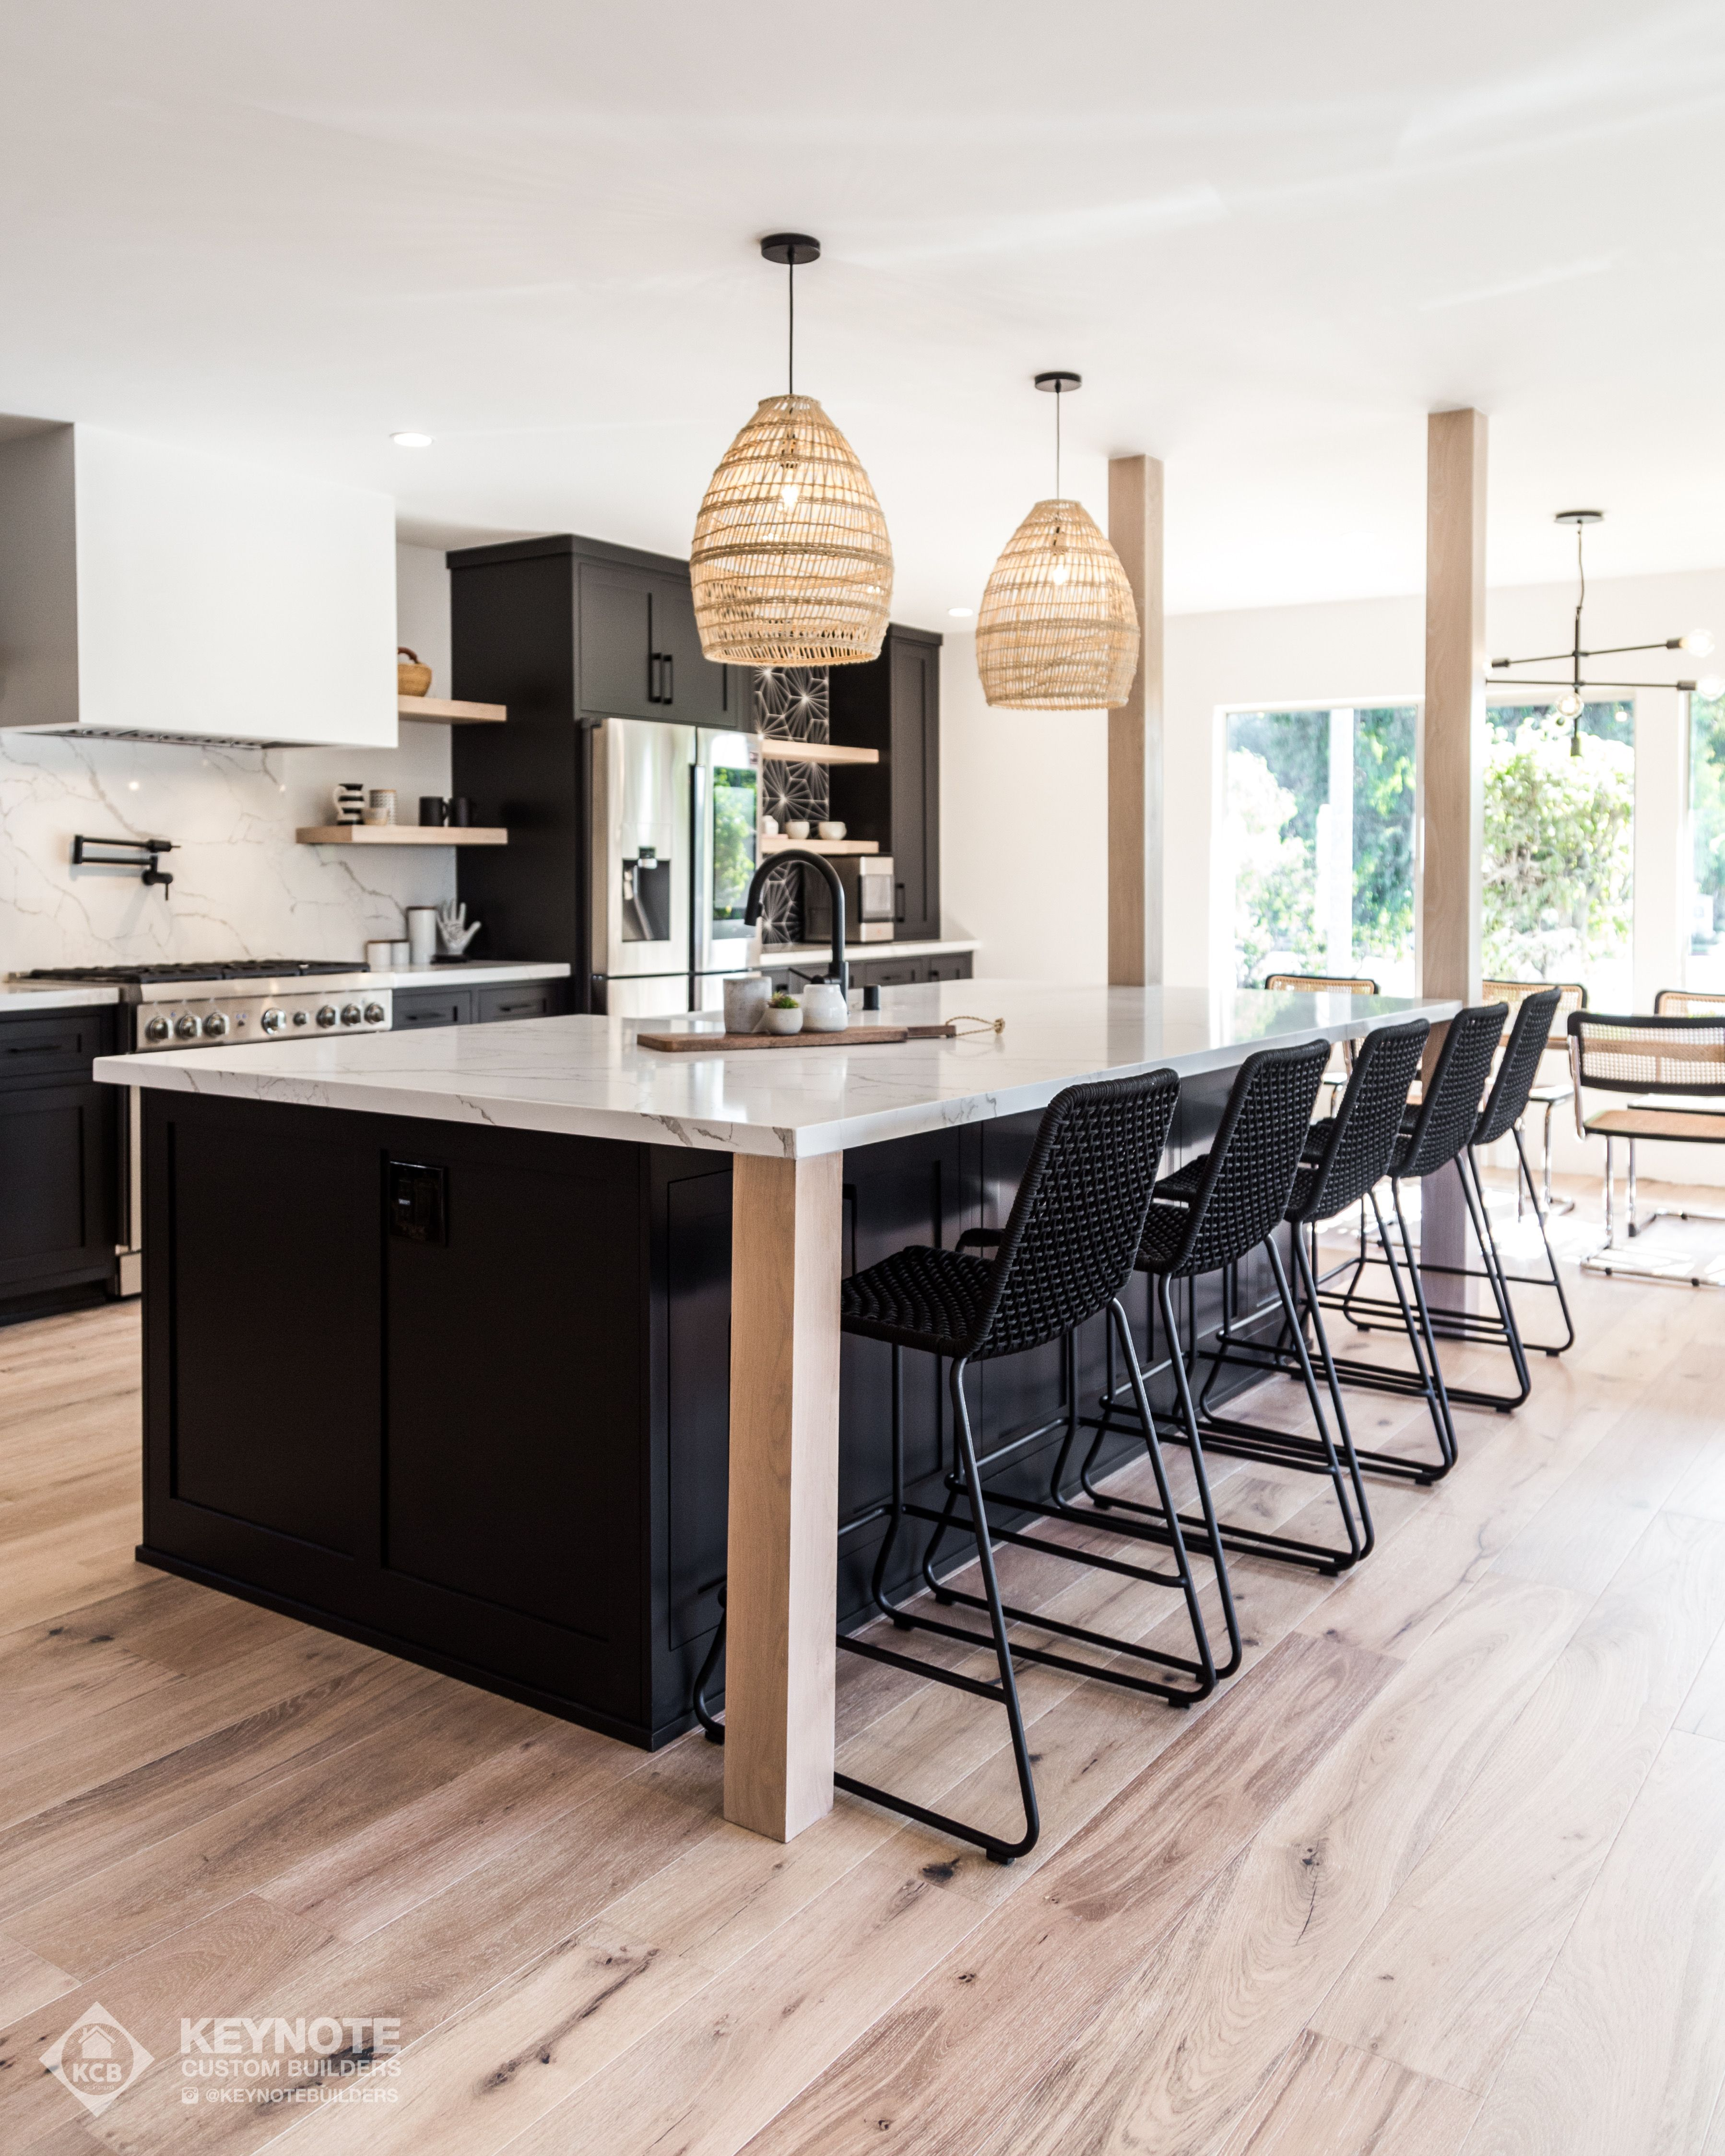 Black modern organic kitchen. White oak floating shelves ... on drywall garage, drywall basement, drywall fireplace, drywall entertainment center, drywall crown molding,